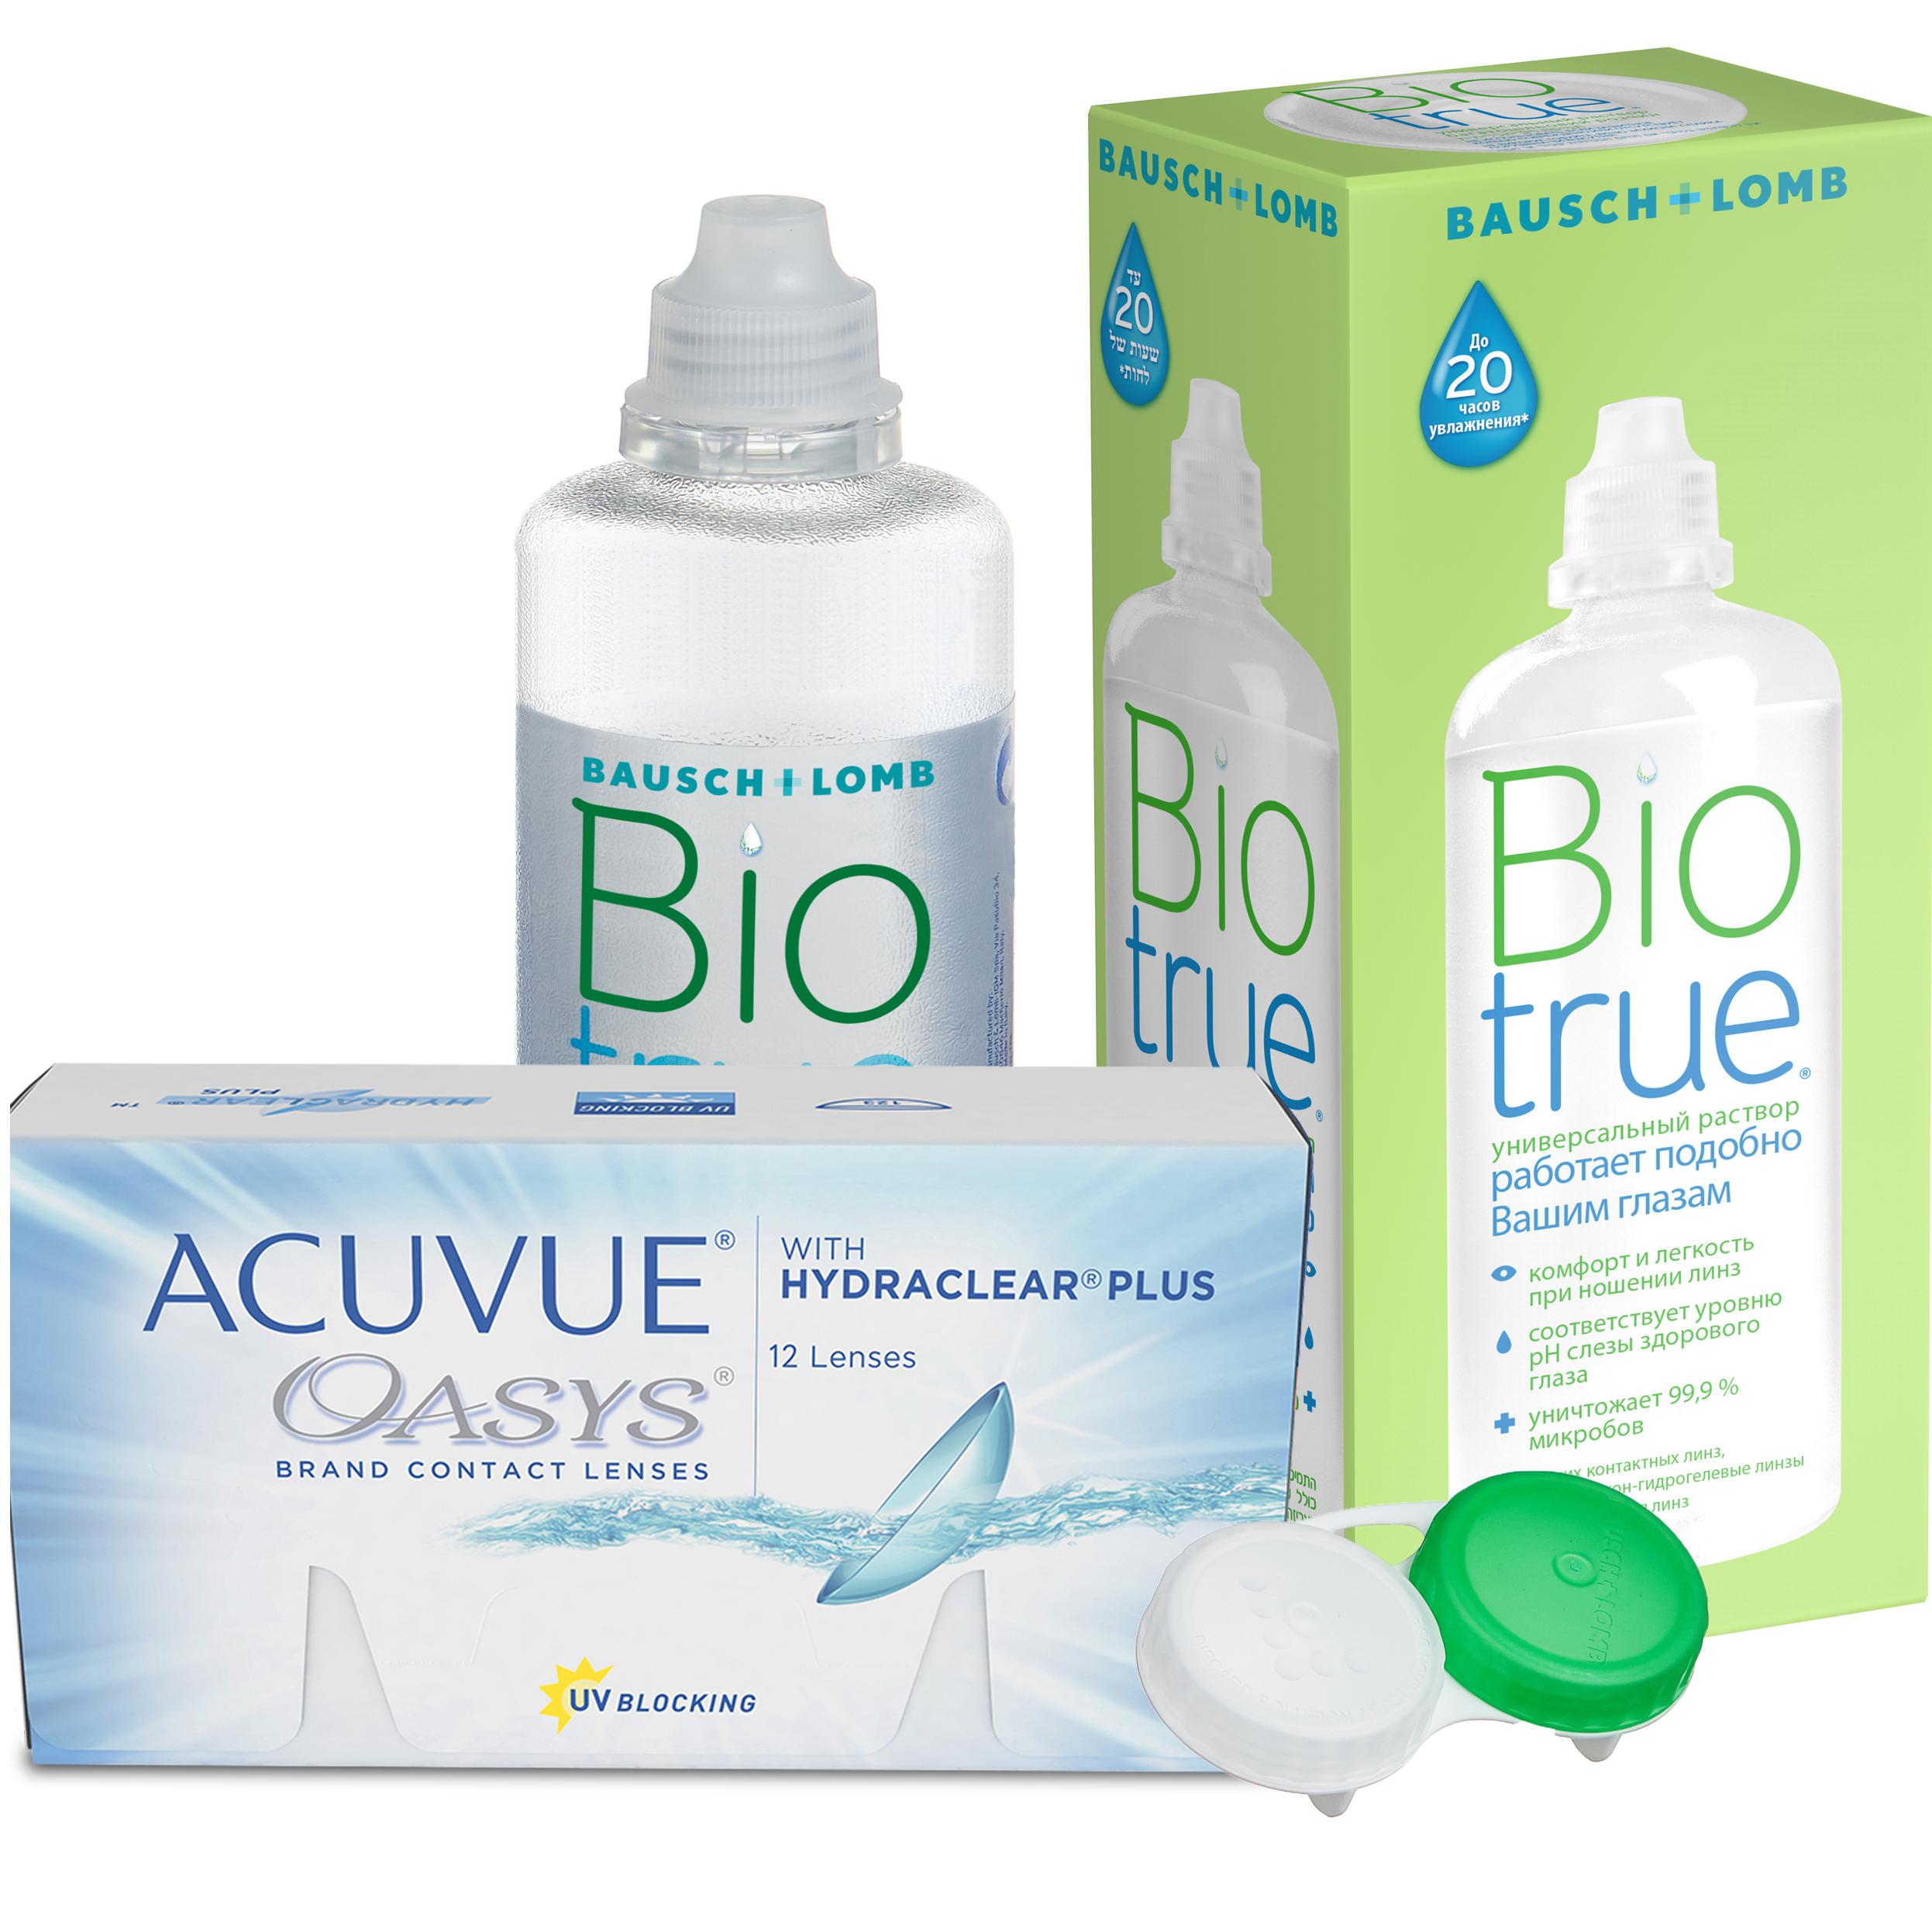 Купить Oasys with Hydraclear Plus 12 линз + Biotrue, Контактные линзы Acuvue Oasys with Hydraclear Plus 12 линз R 8.8 -4, 25 + Biotrue 300 мл